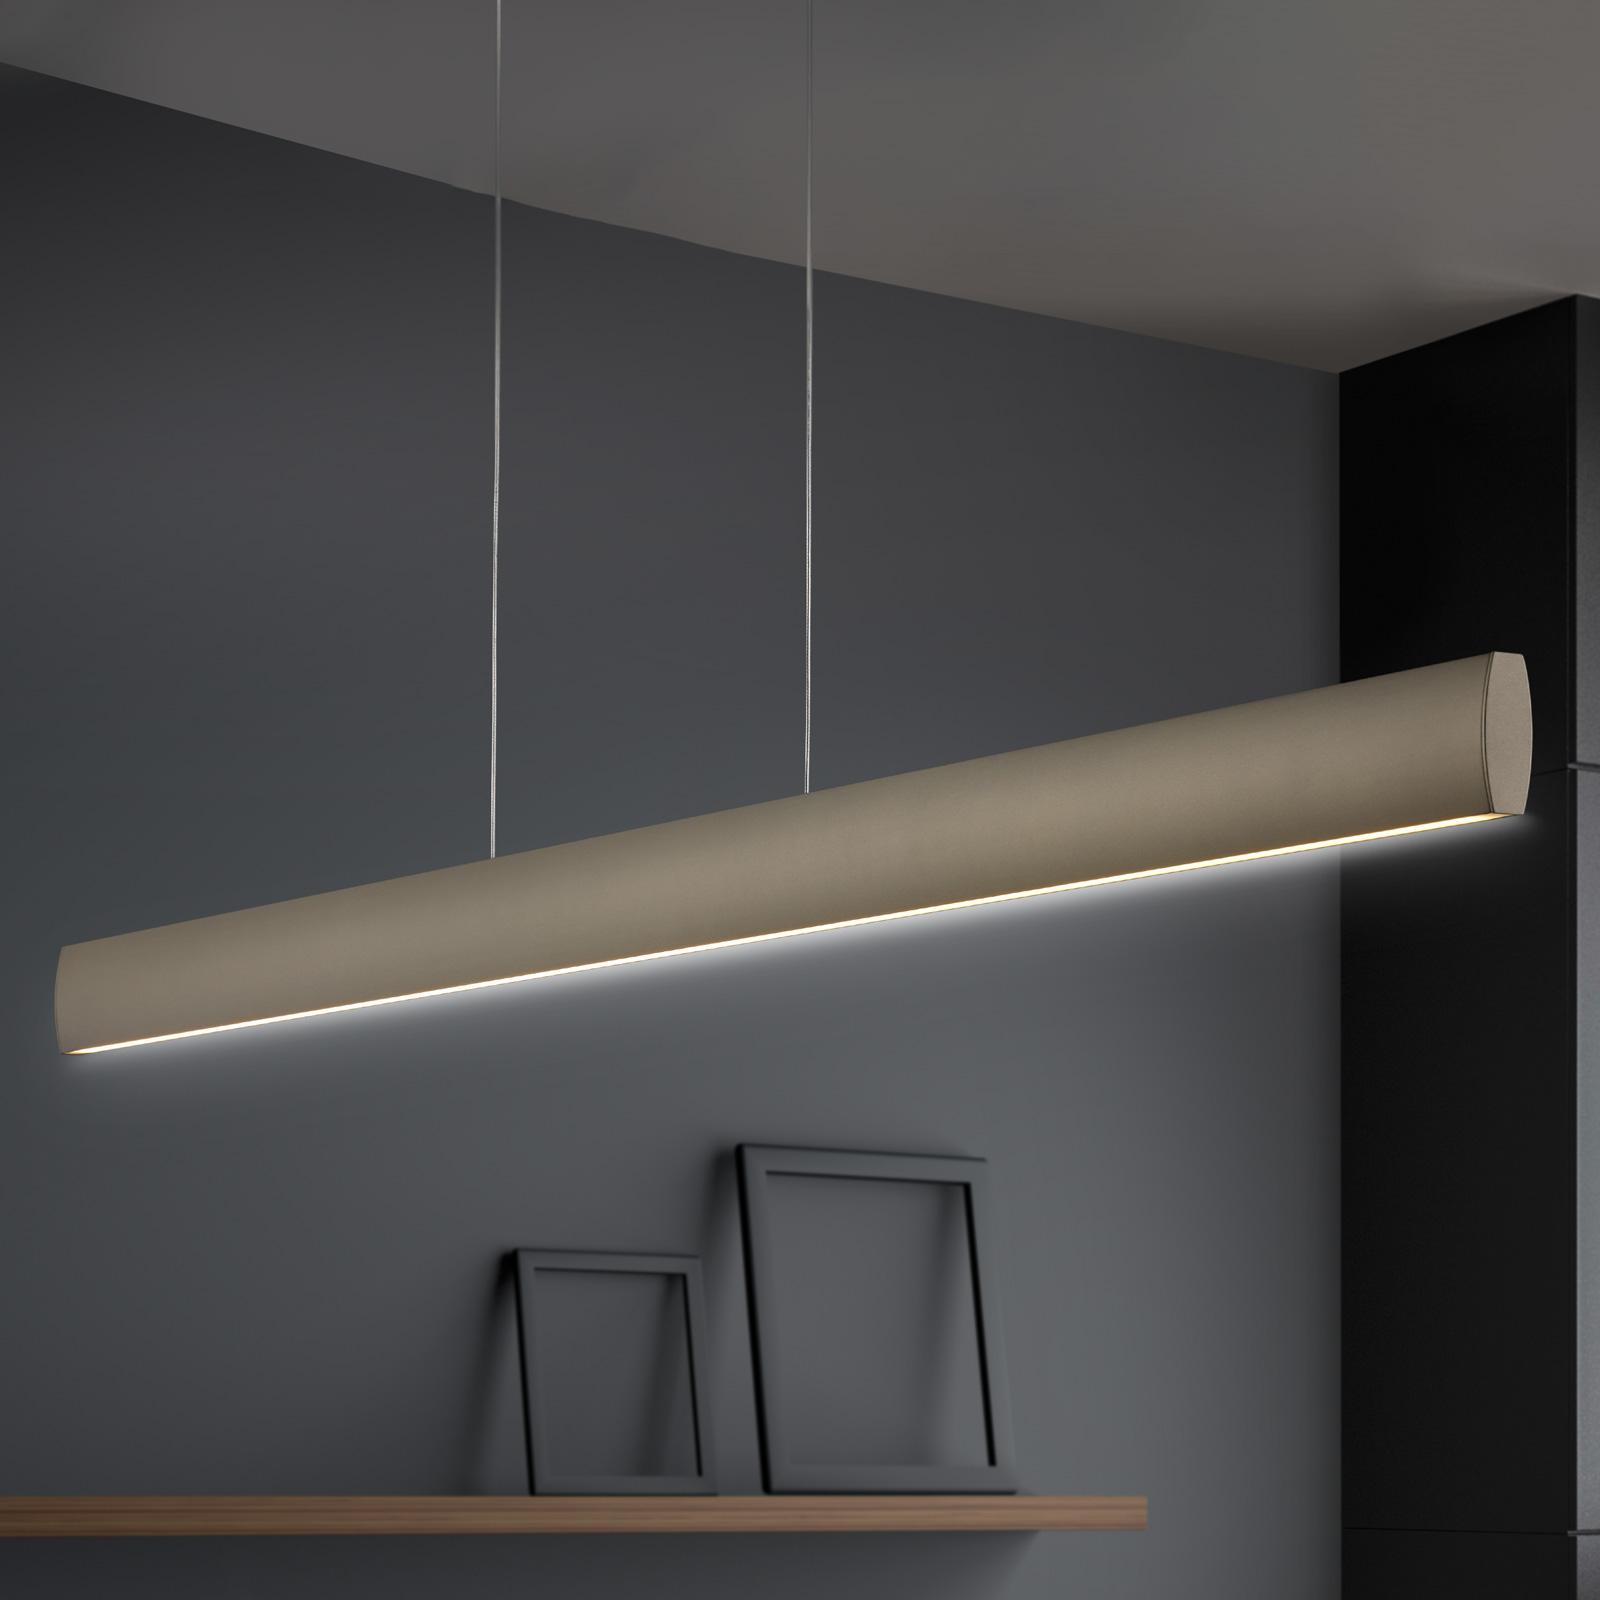 LED hanglamp Runa, brons, lengte 92 cm